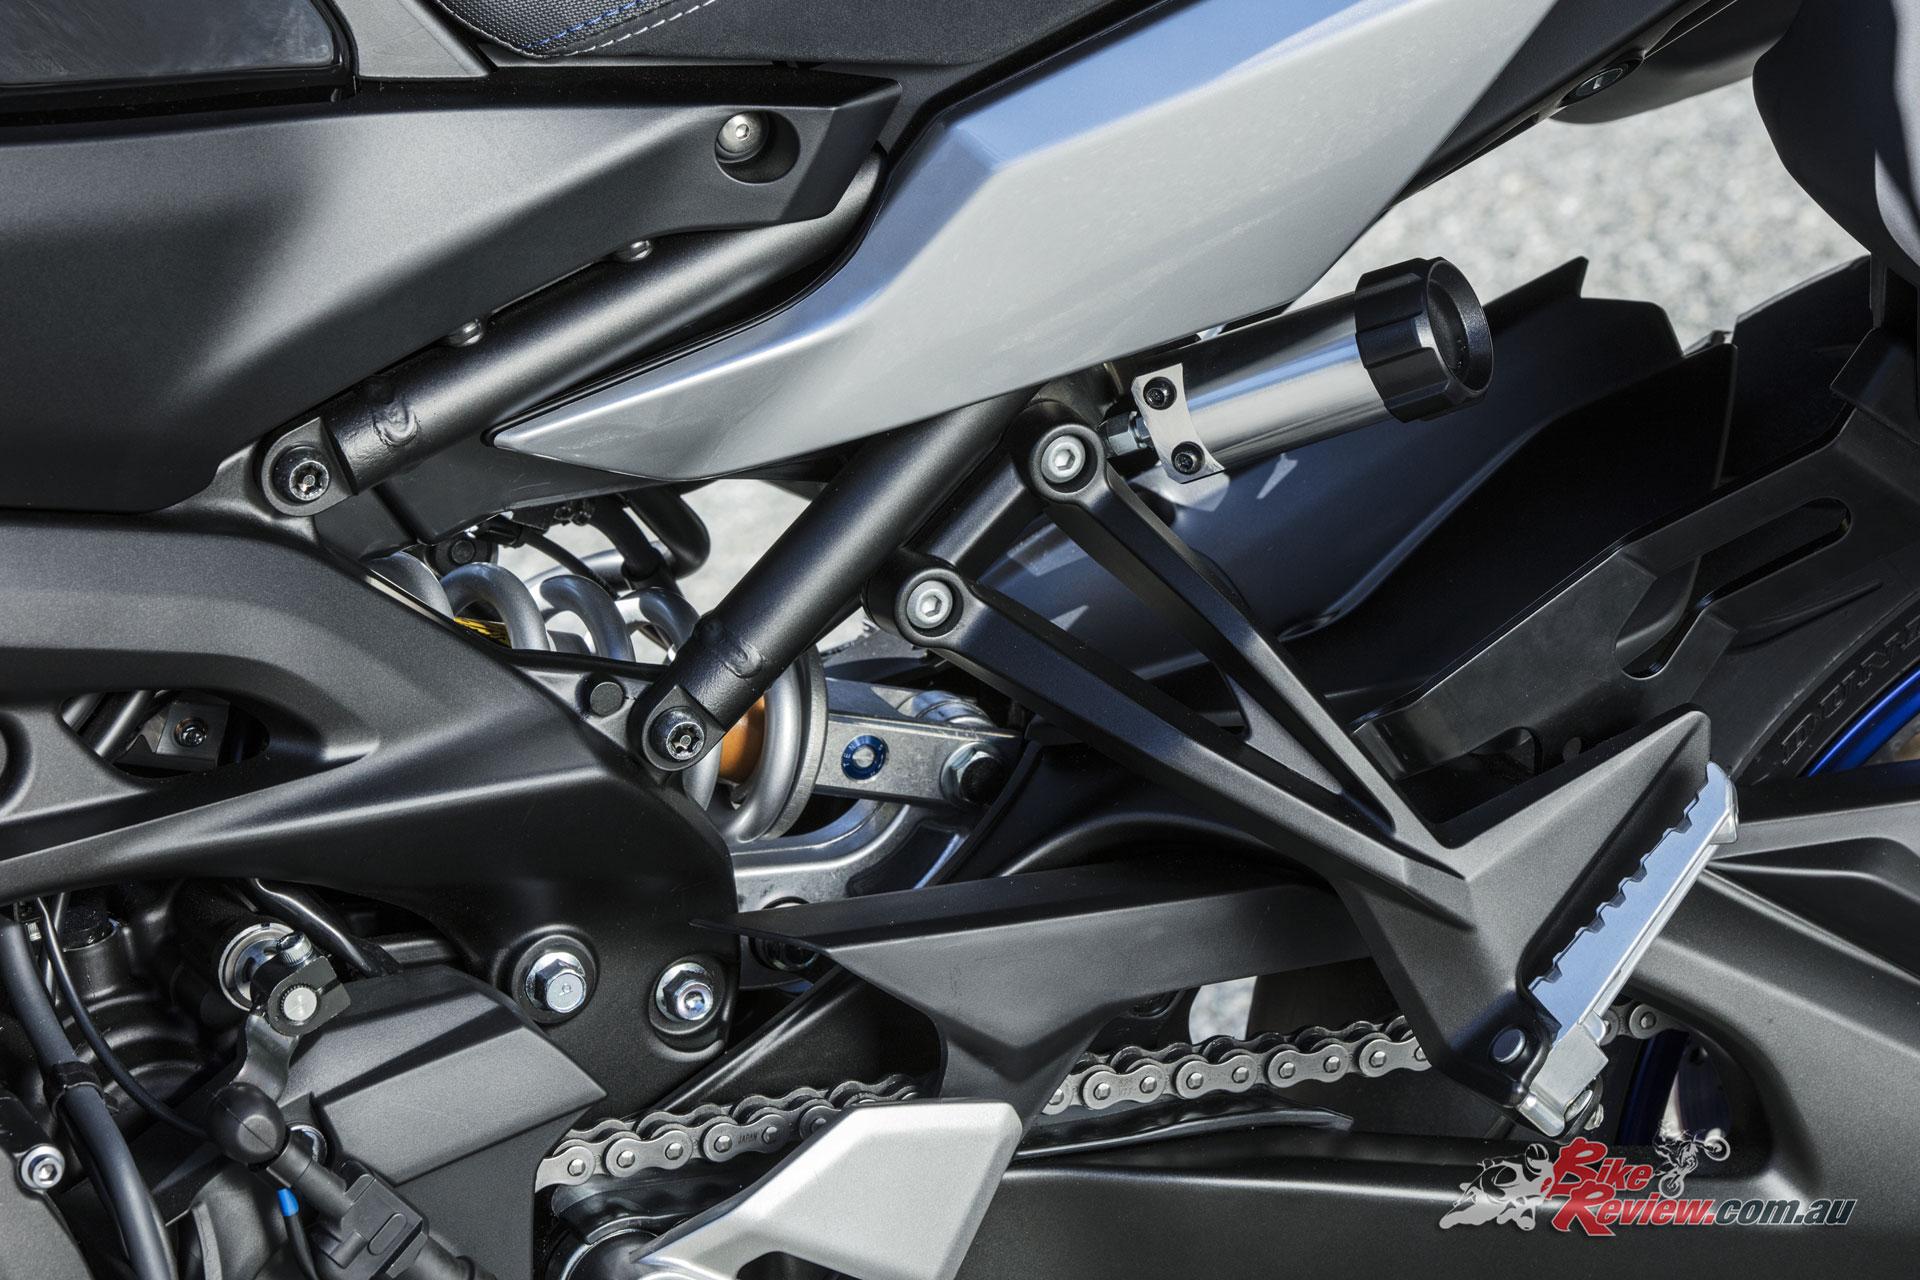 2018 Yamaha Tracer 900GT